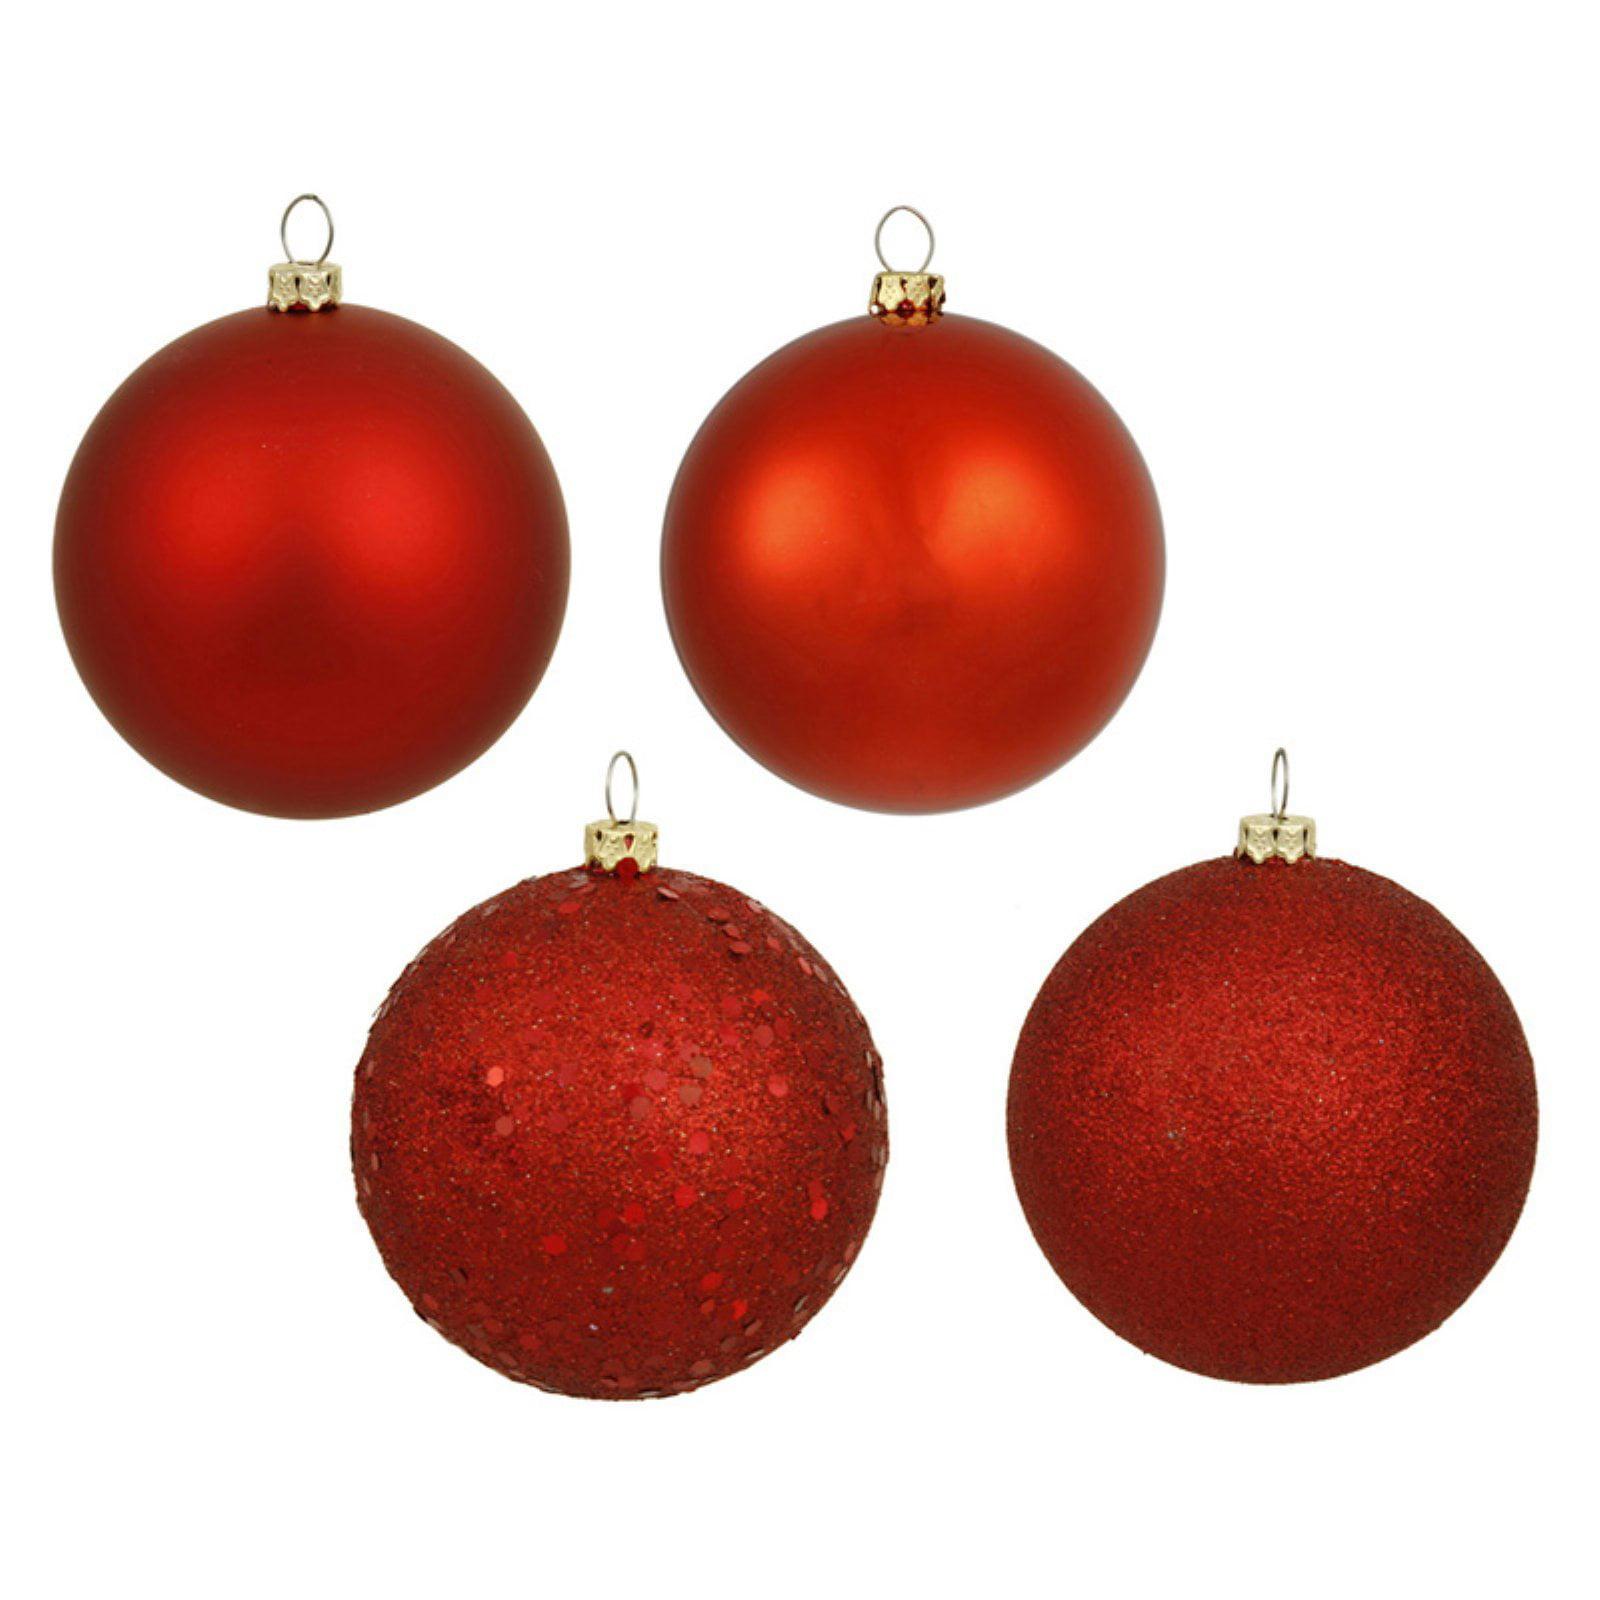 "Vickerman 3"" Red 4-Finish Ornament Assortment, Set of 16"